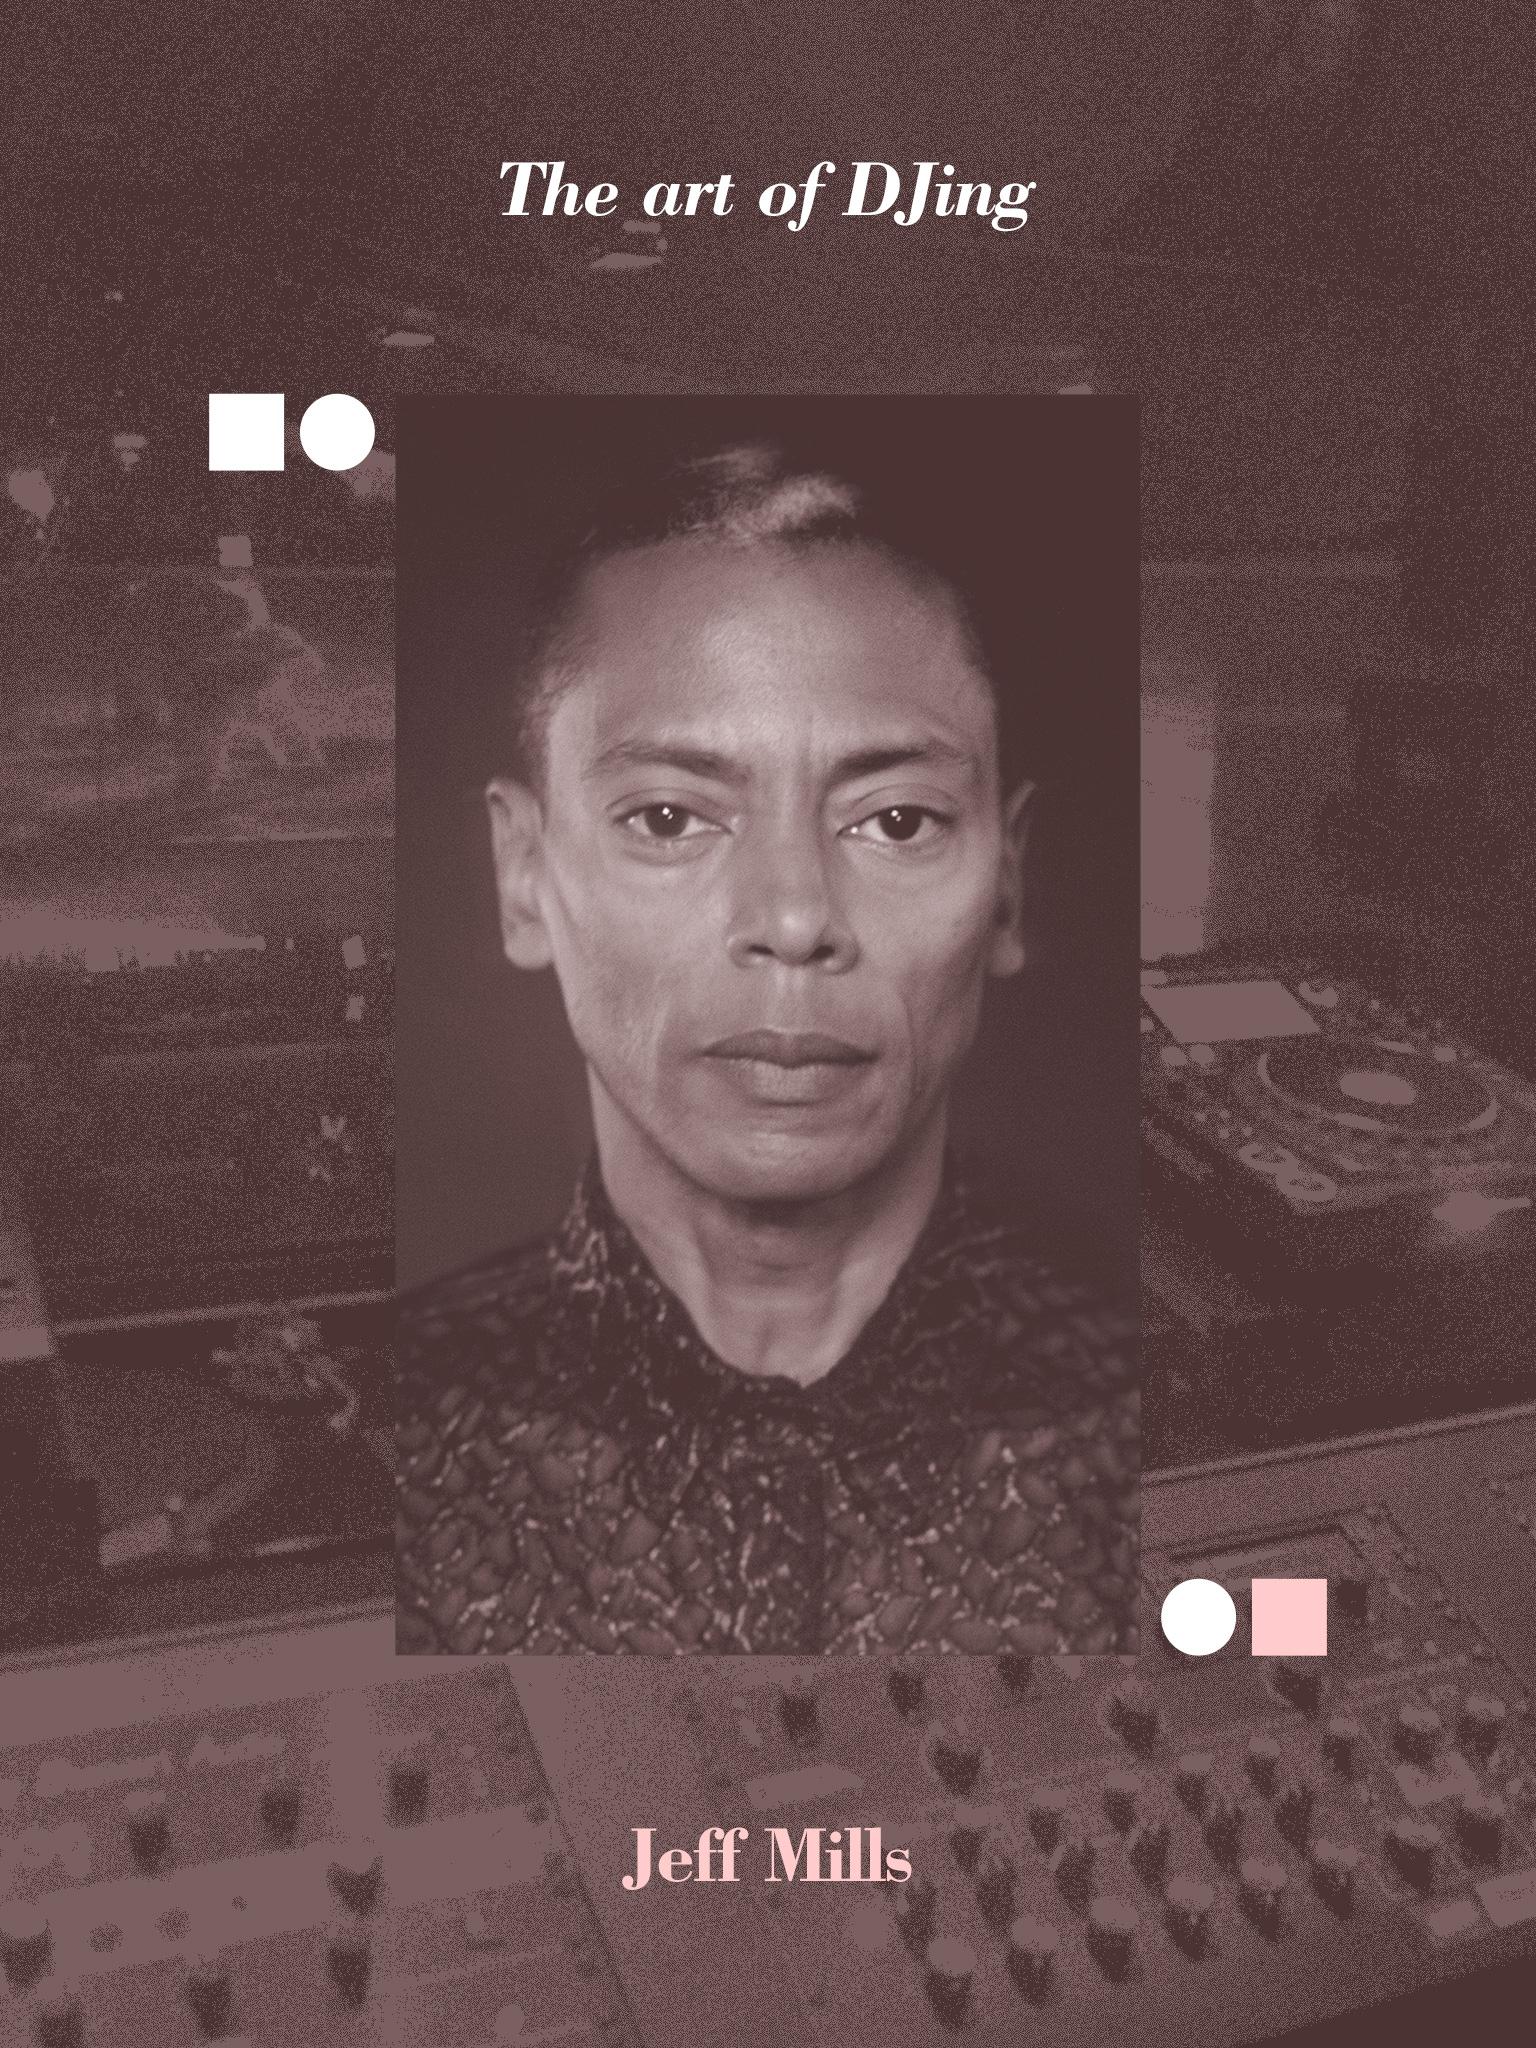 RA: The art of DJing: Jeff Mills